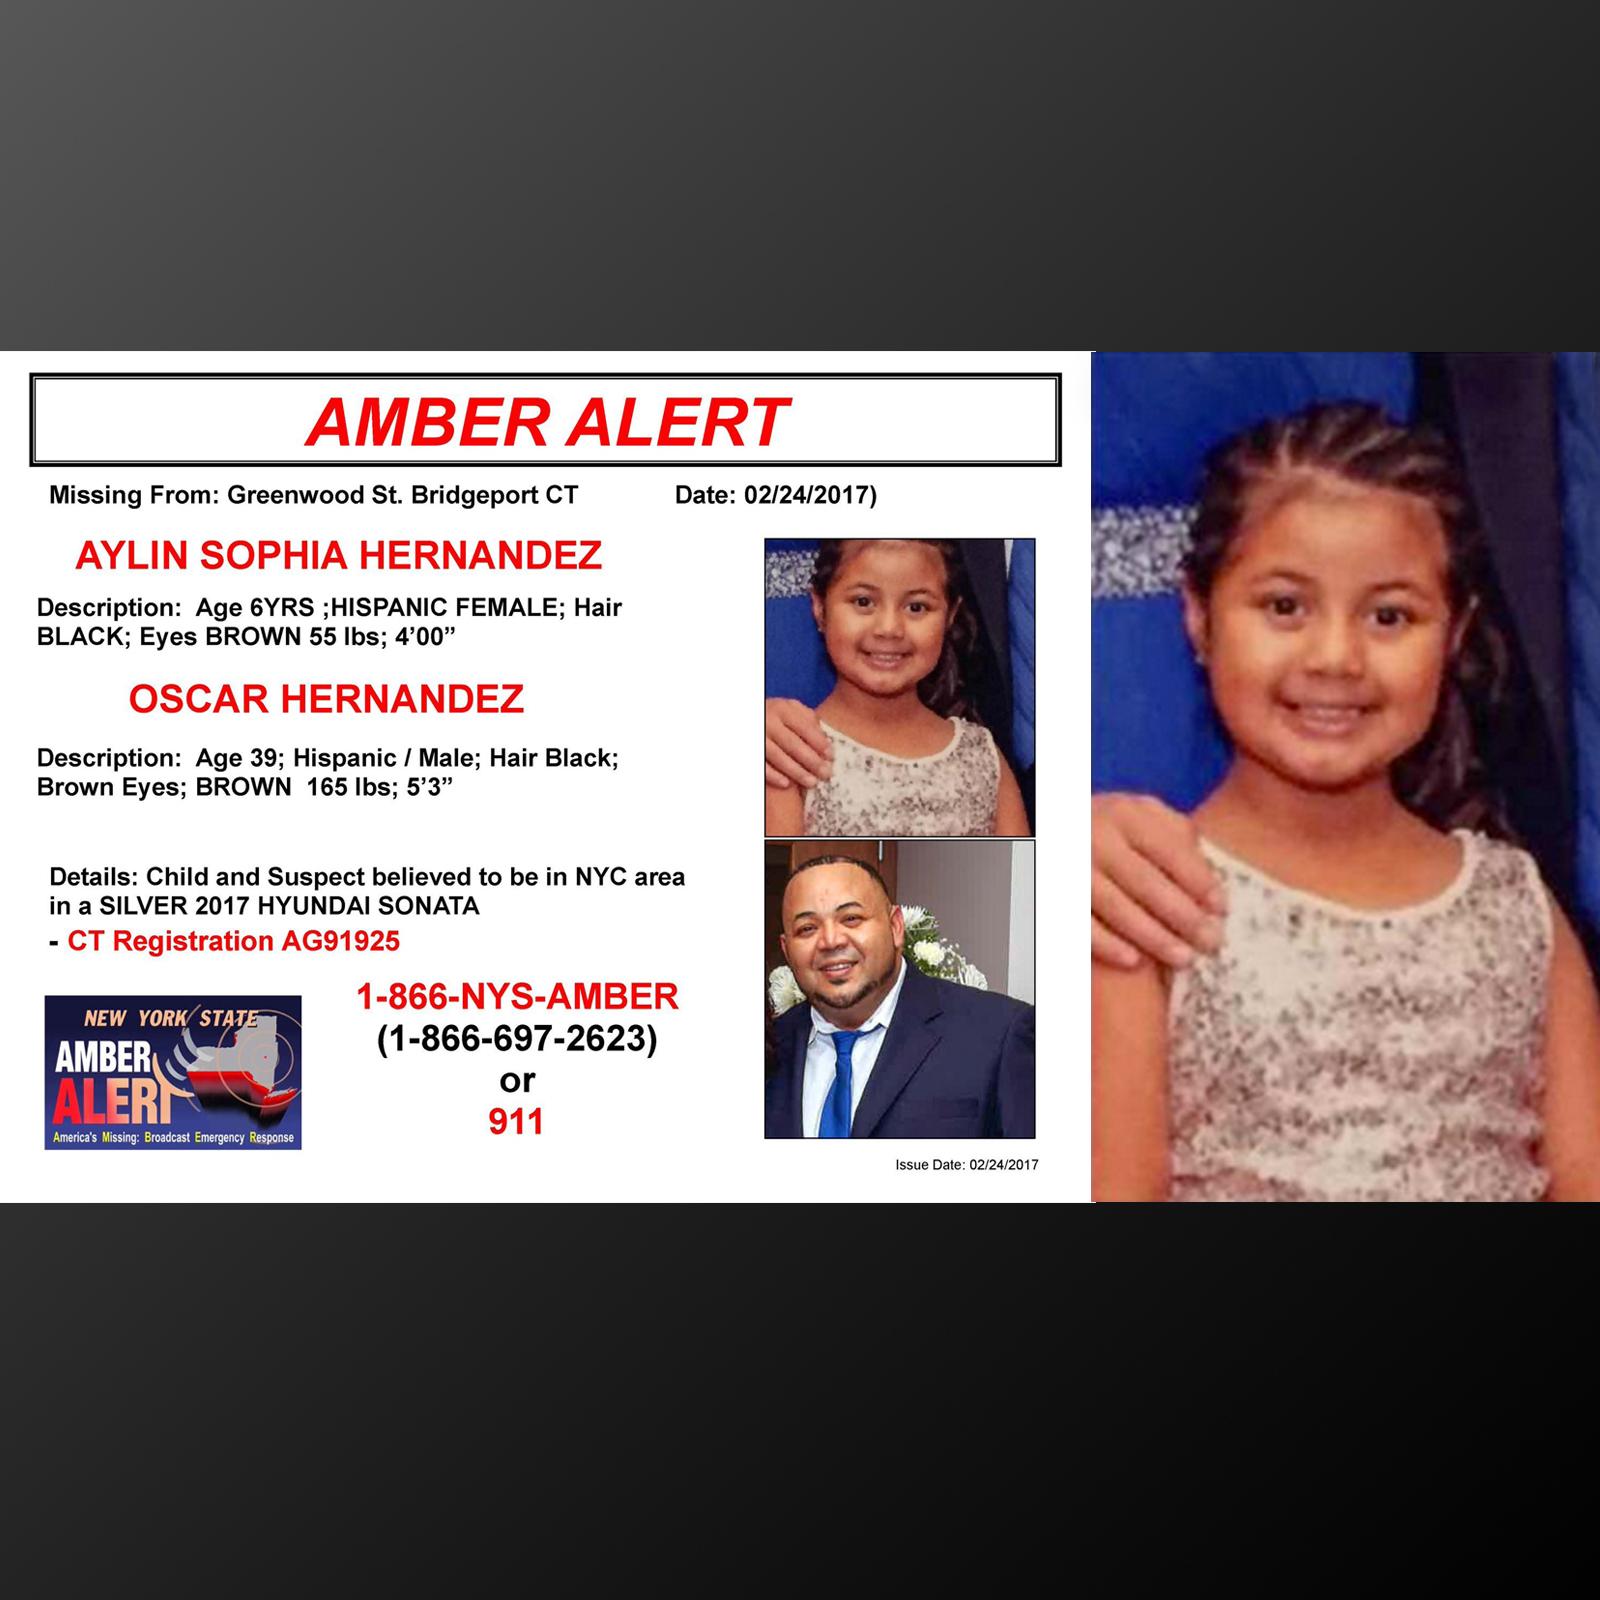 Alerta Amber por Aylin Sophia Hernández